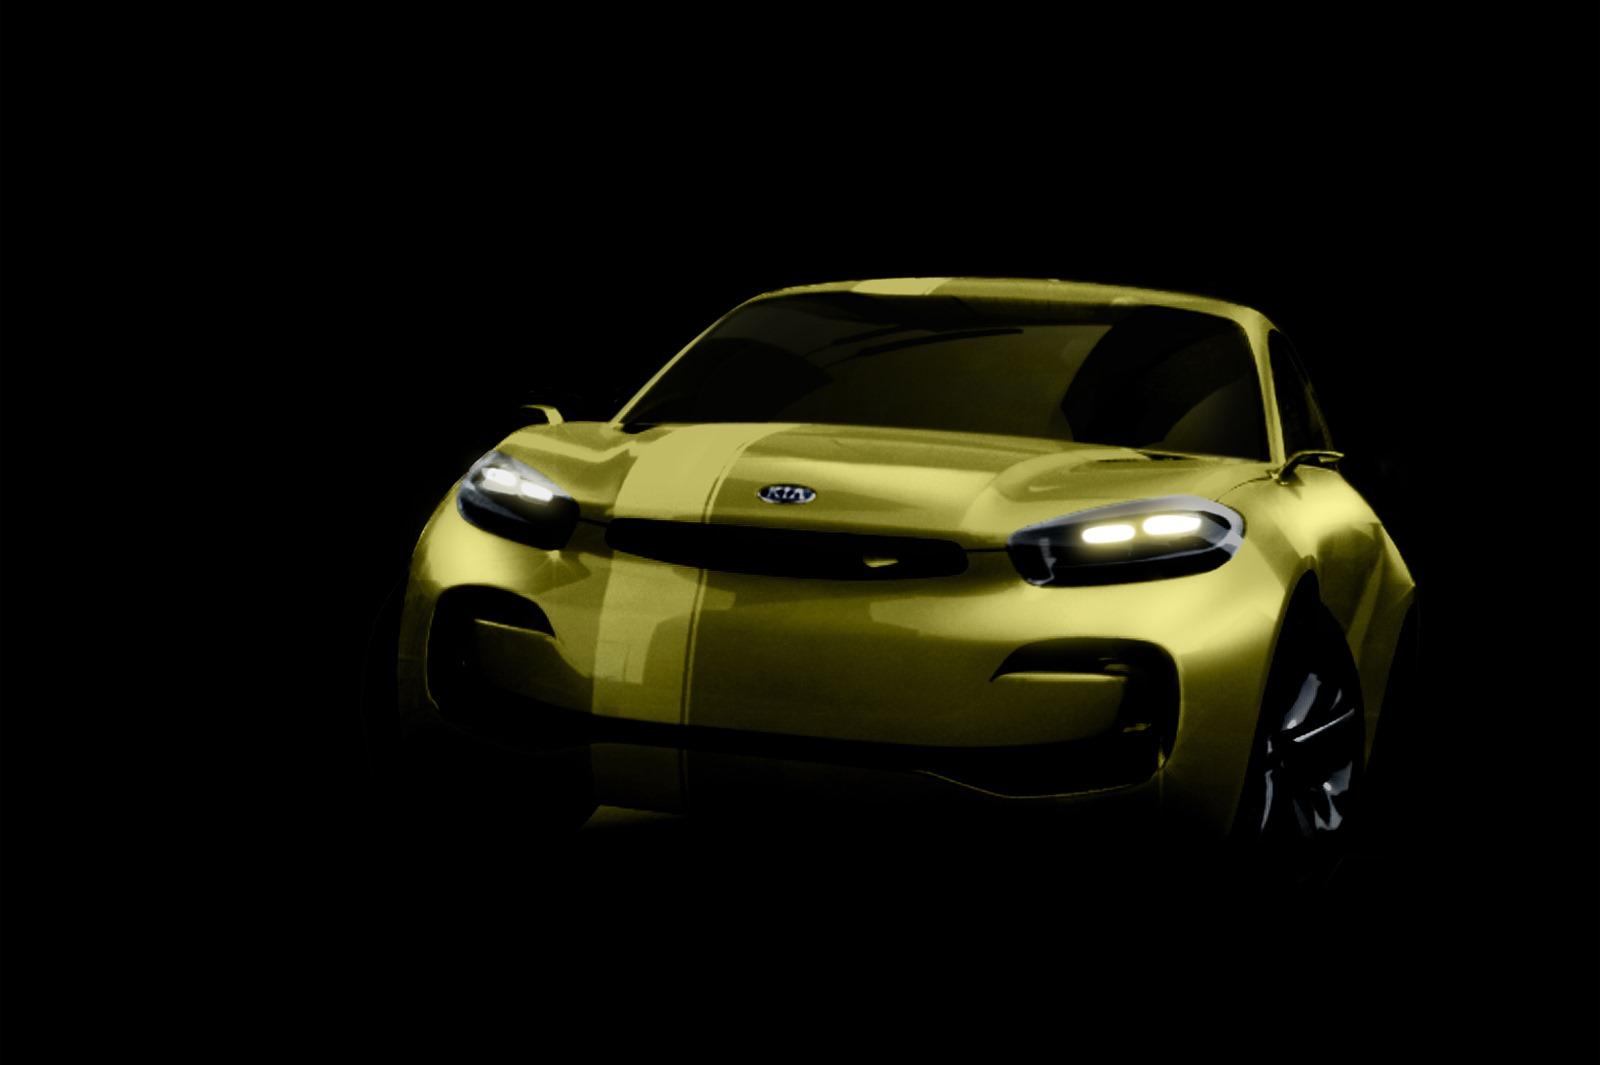 Kia tiết lộ CUB coupe Concept